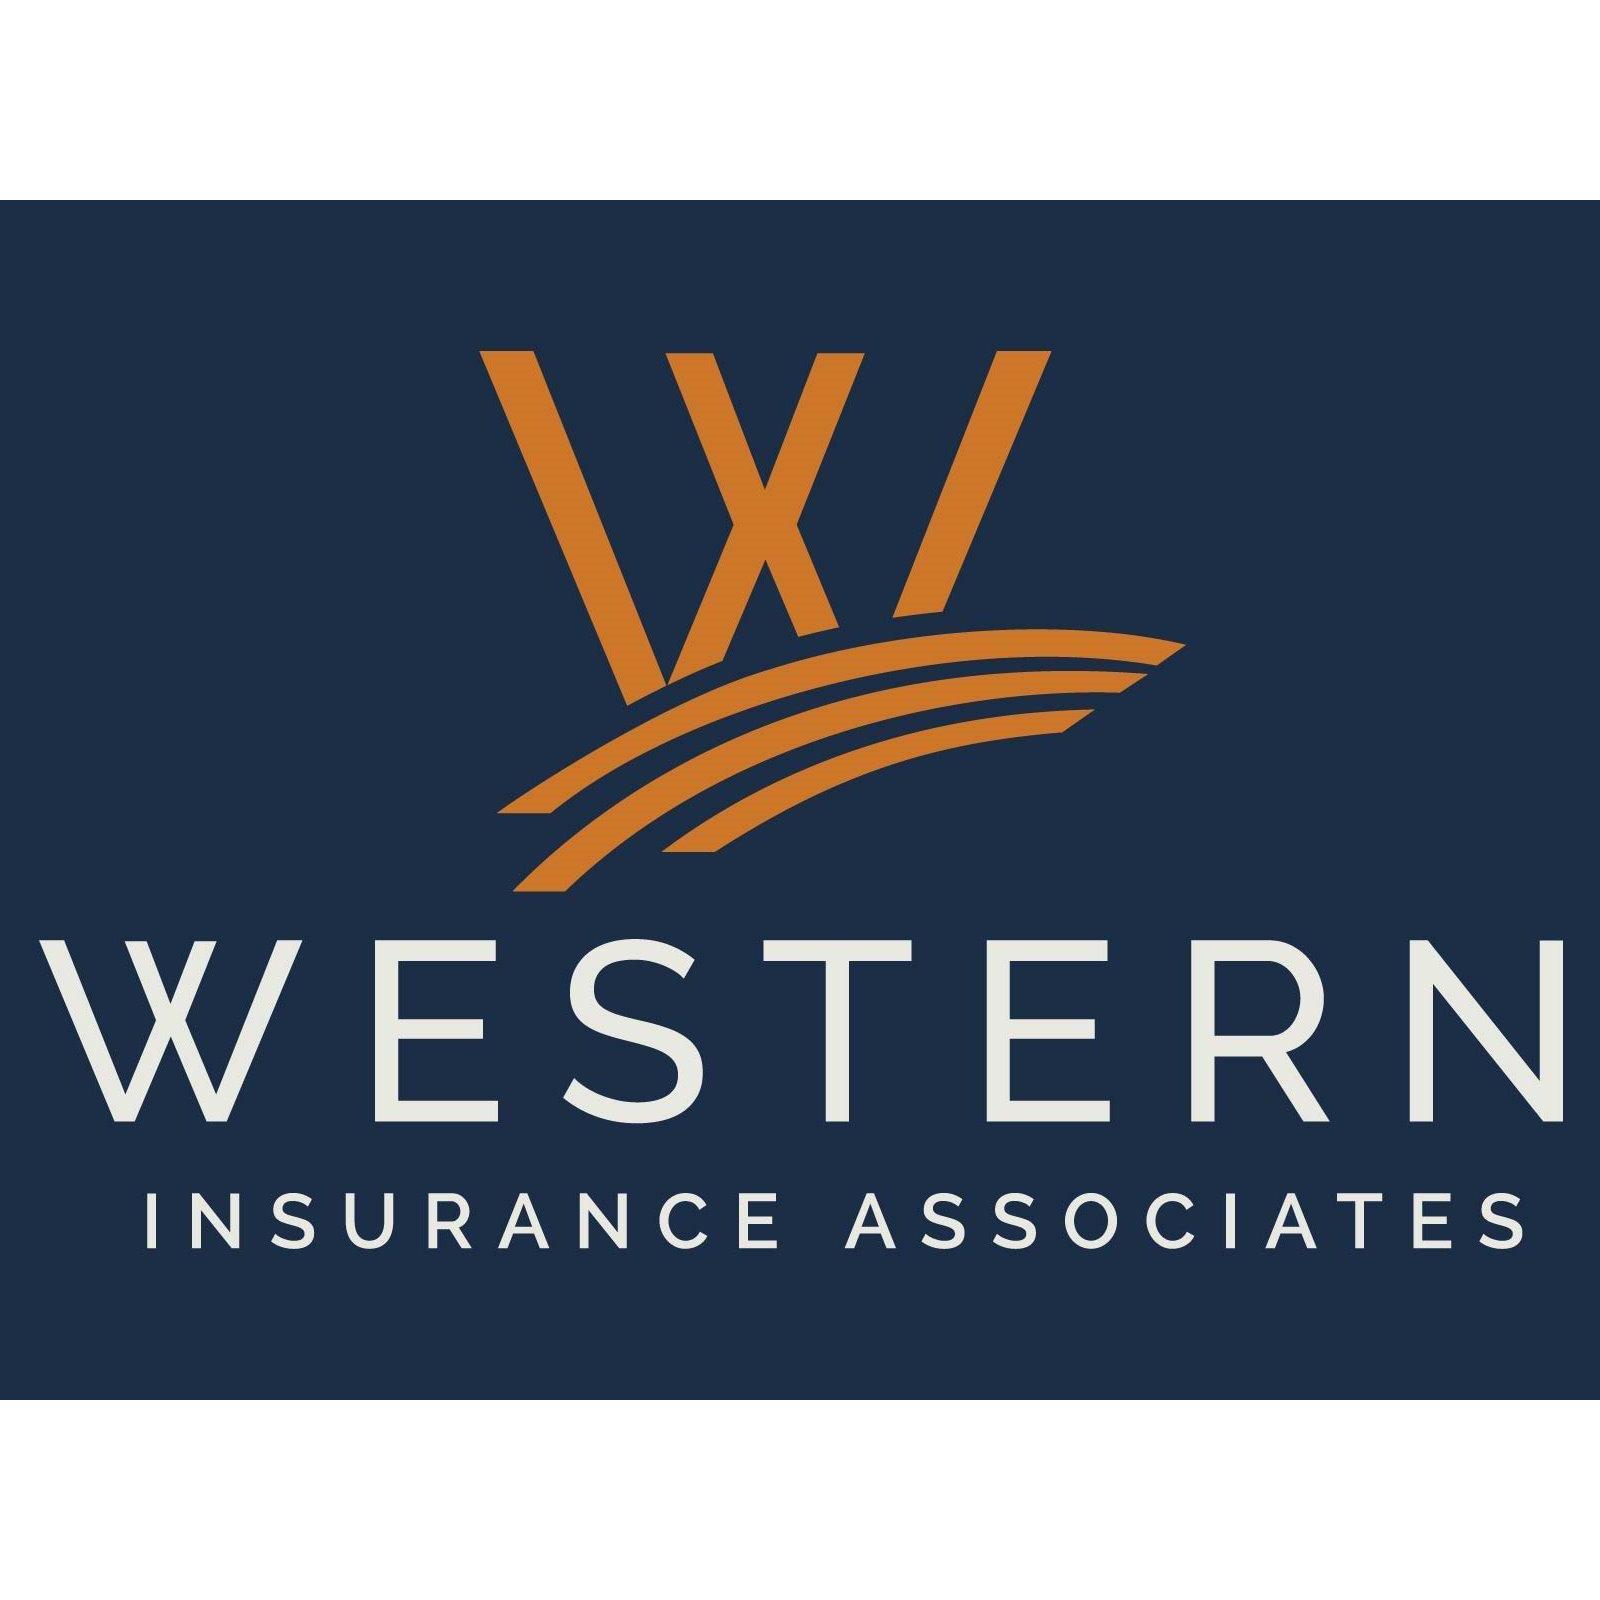 Western Insurance Associates